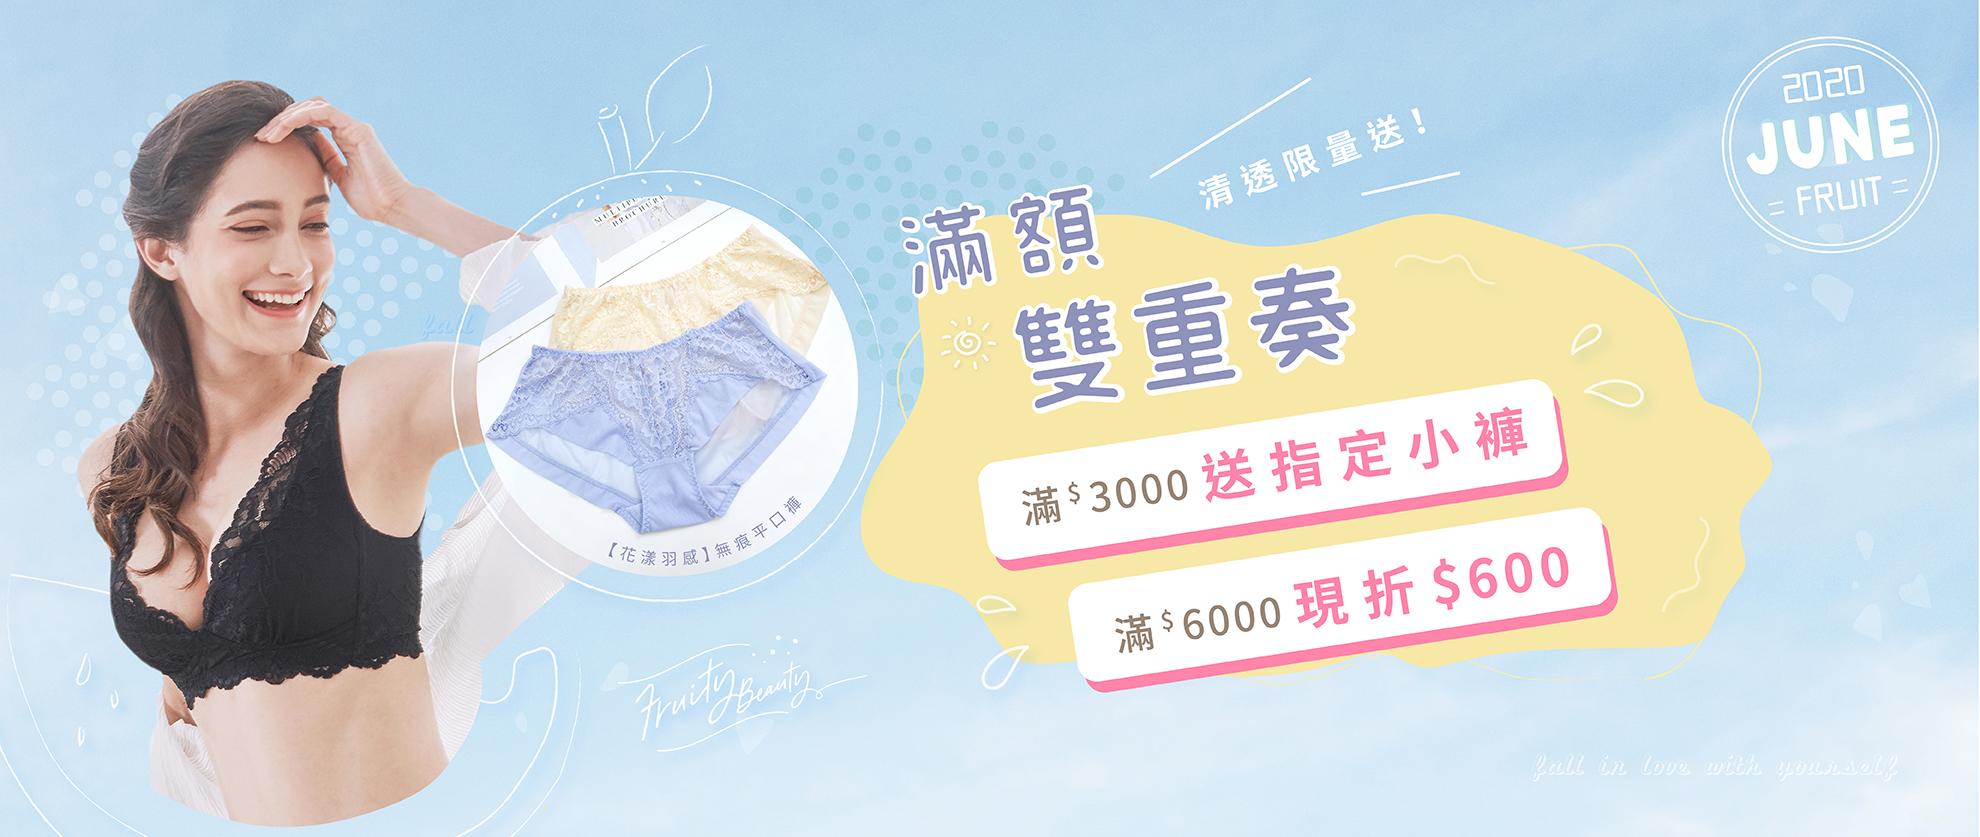 20200601_summerfruit_3000panty